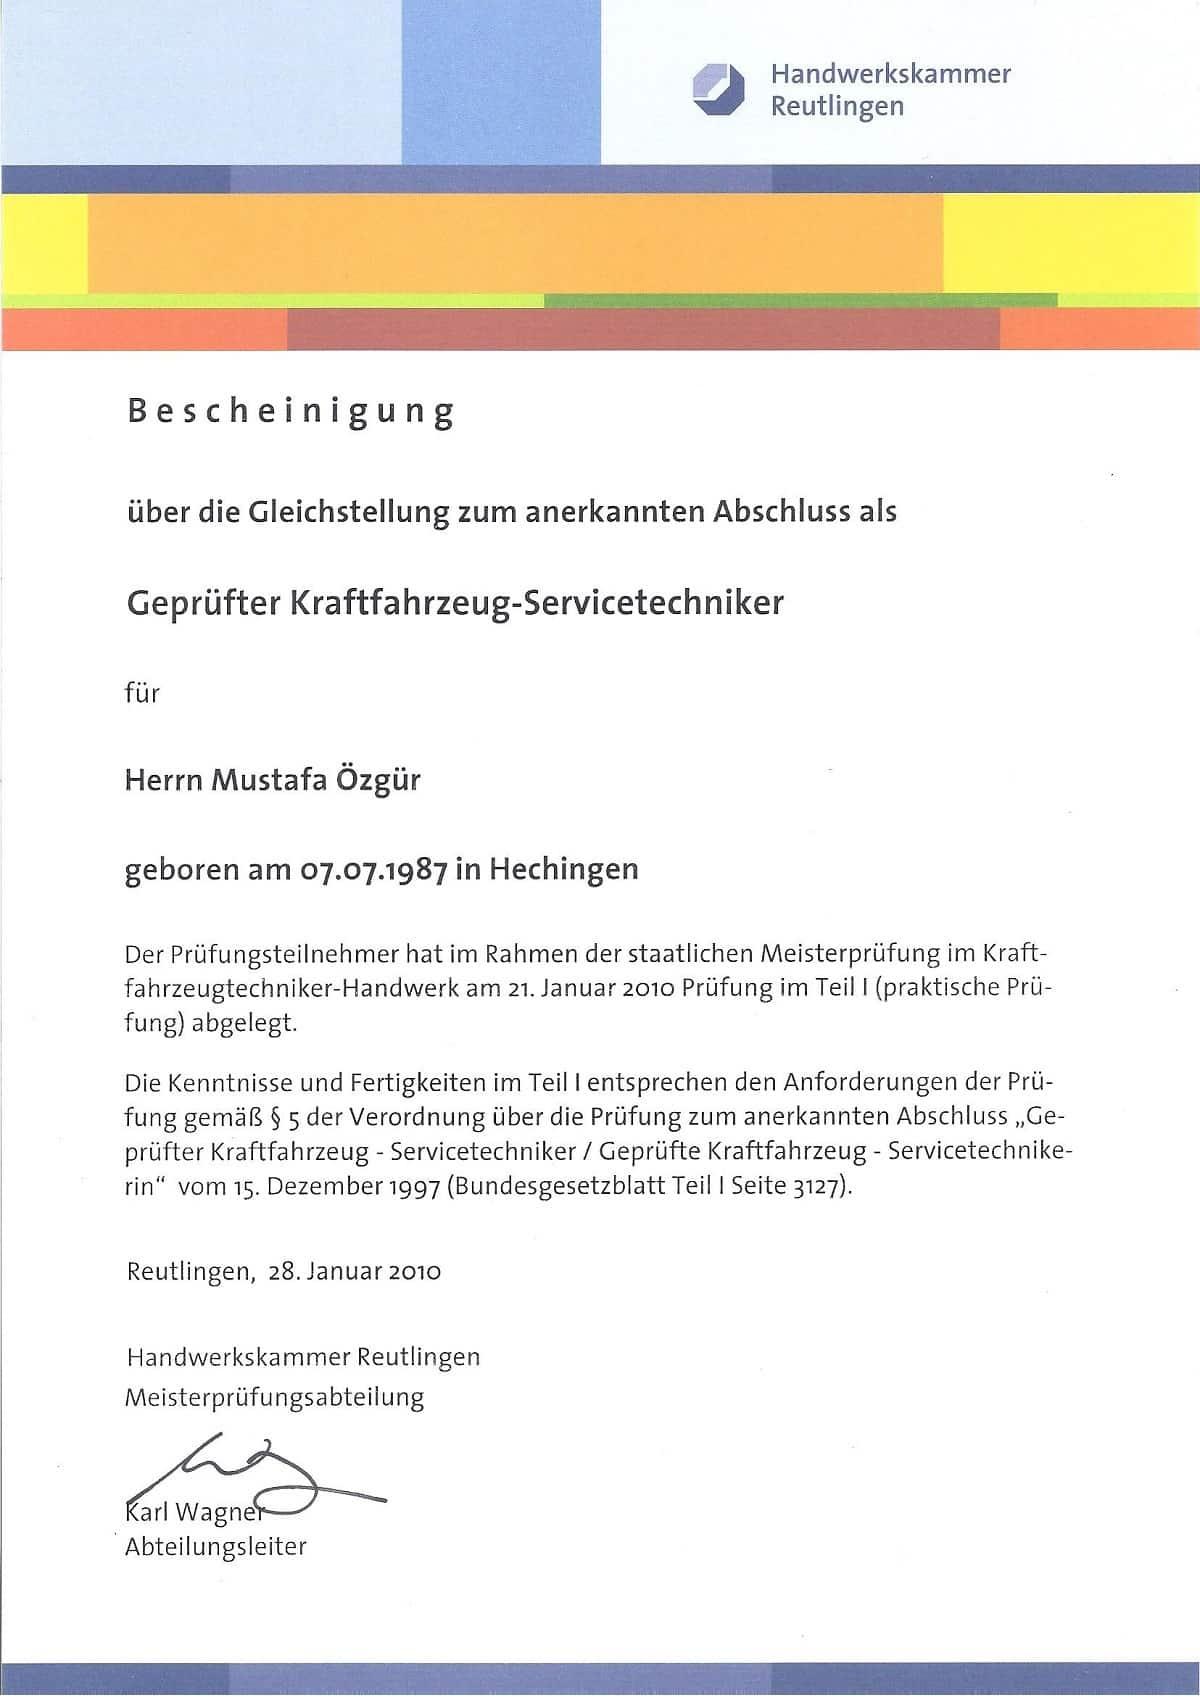 KFZ Srevicetchniker Bescheinigung Özgür